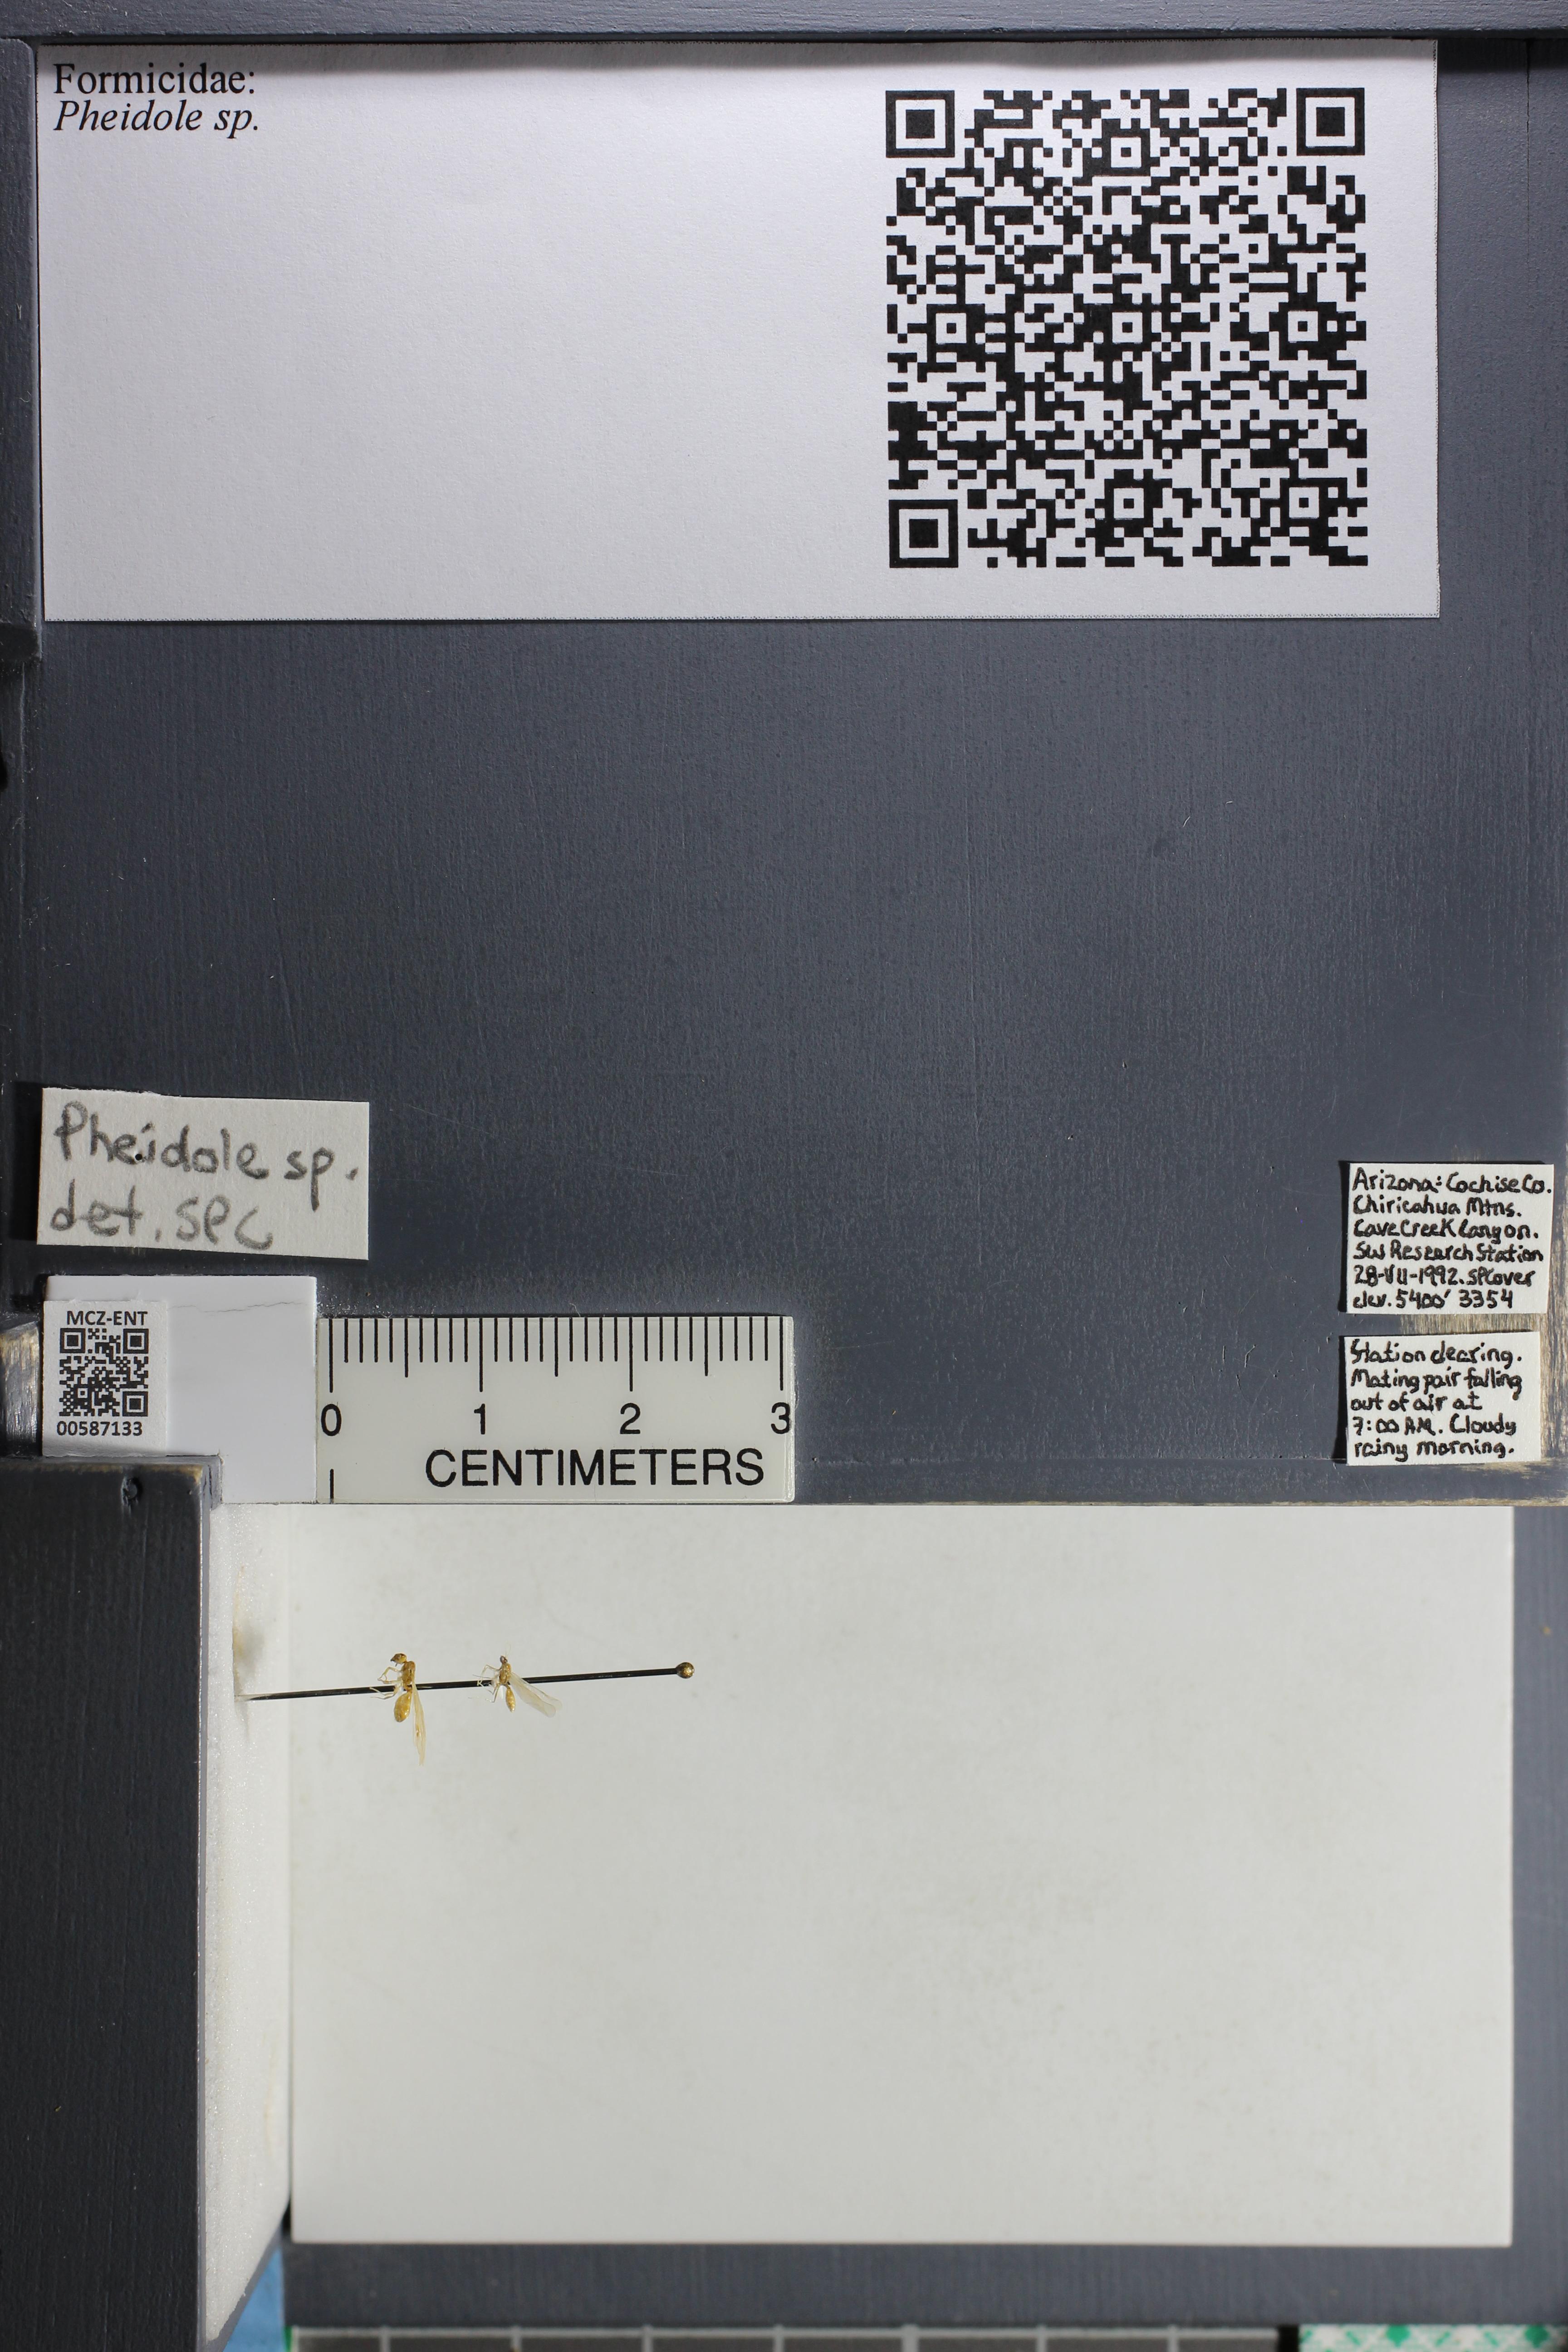 Media of type image, MCZ:Ent:587133 Identified as Pheidole tysoni.